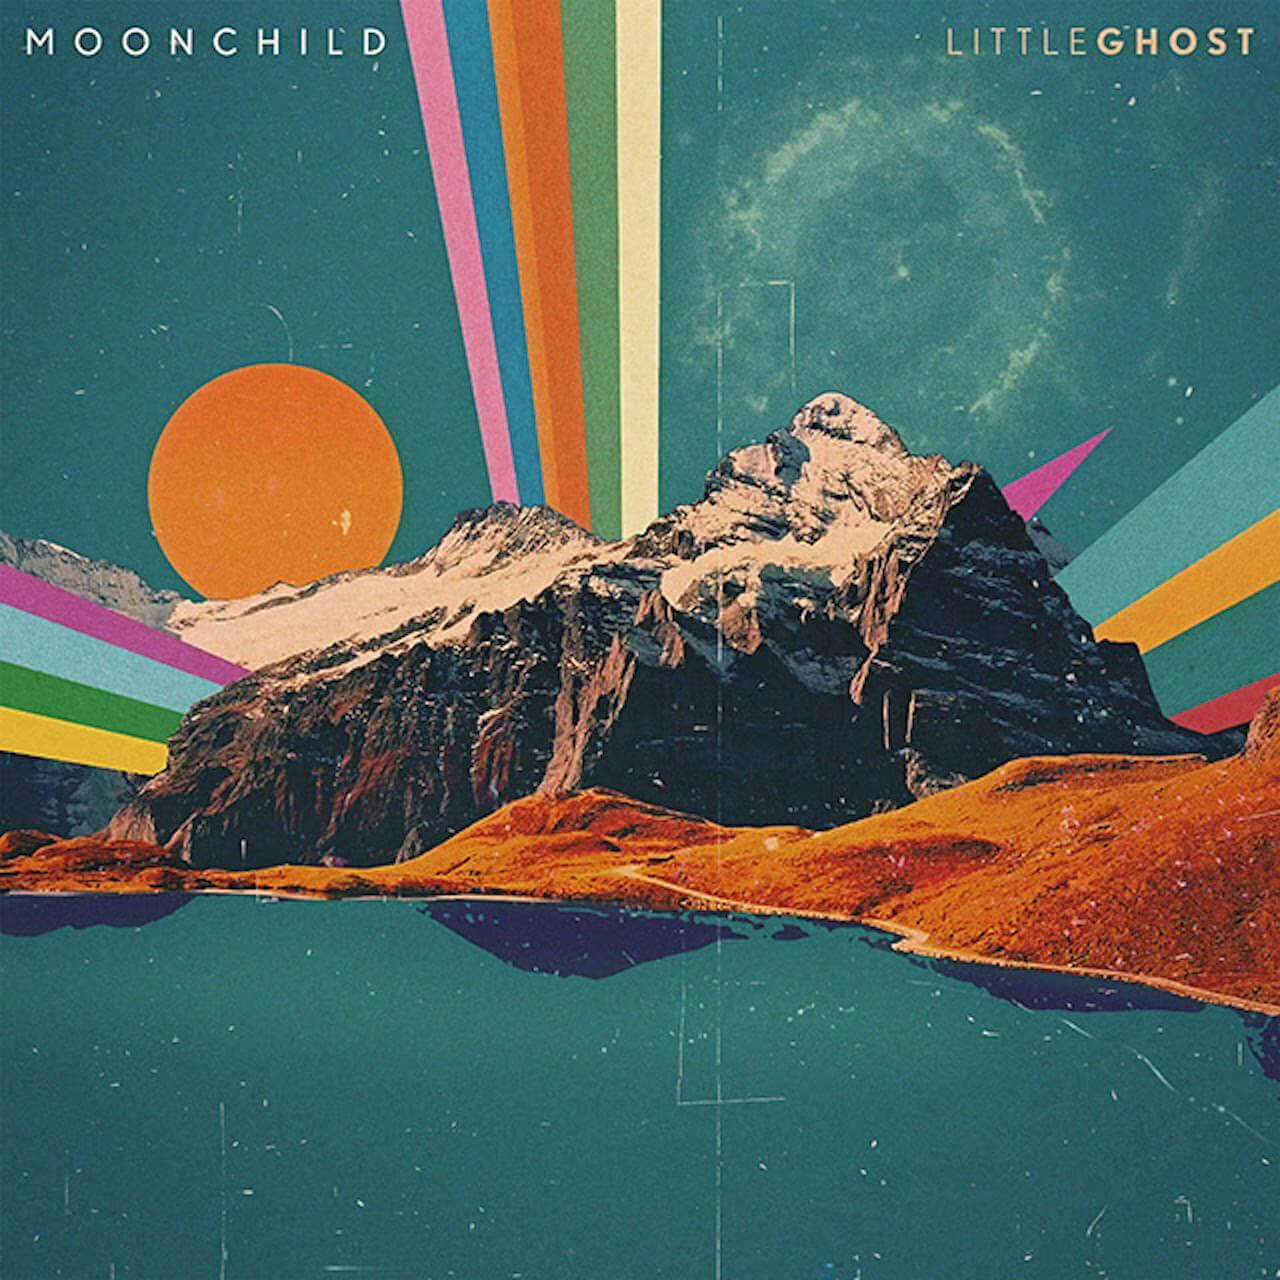 Moonchild、9月リリースの新作『Little Ghost』より新曲「Money」を公開 Karriem Riggins「Bahia Dreamin'」などから影響 music190816-moonchild-2